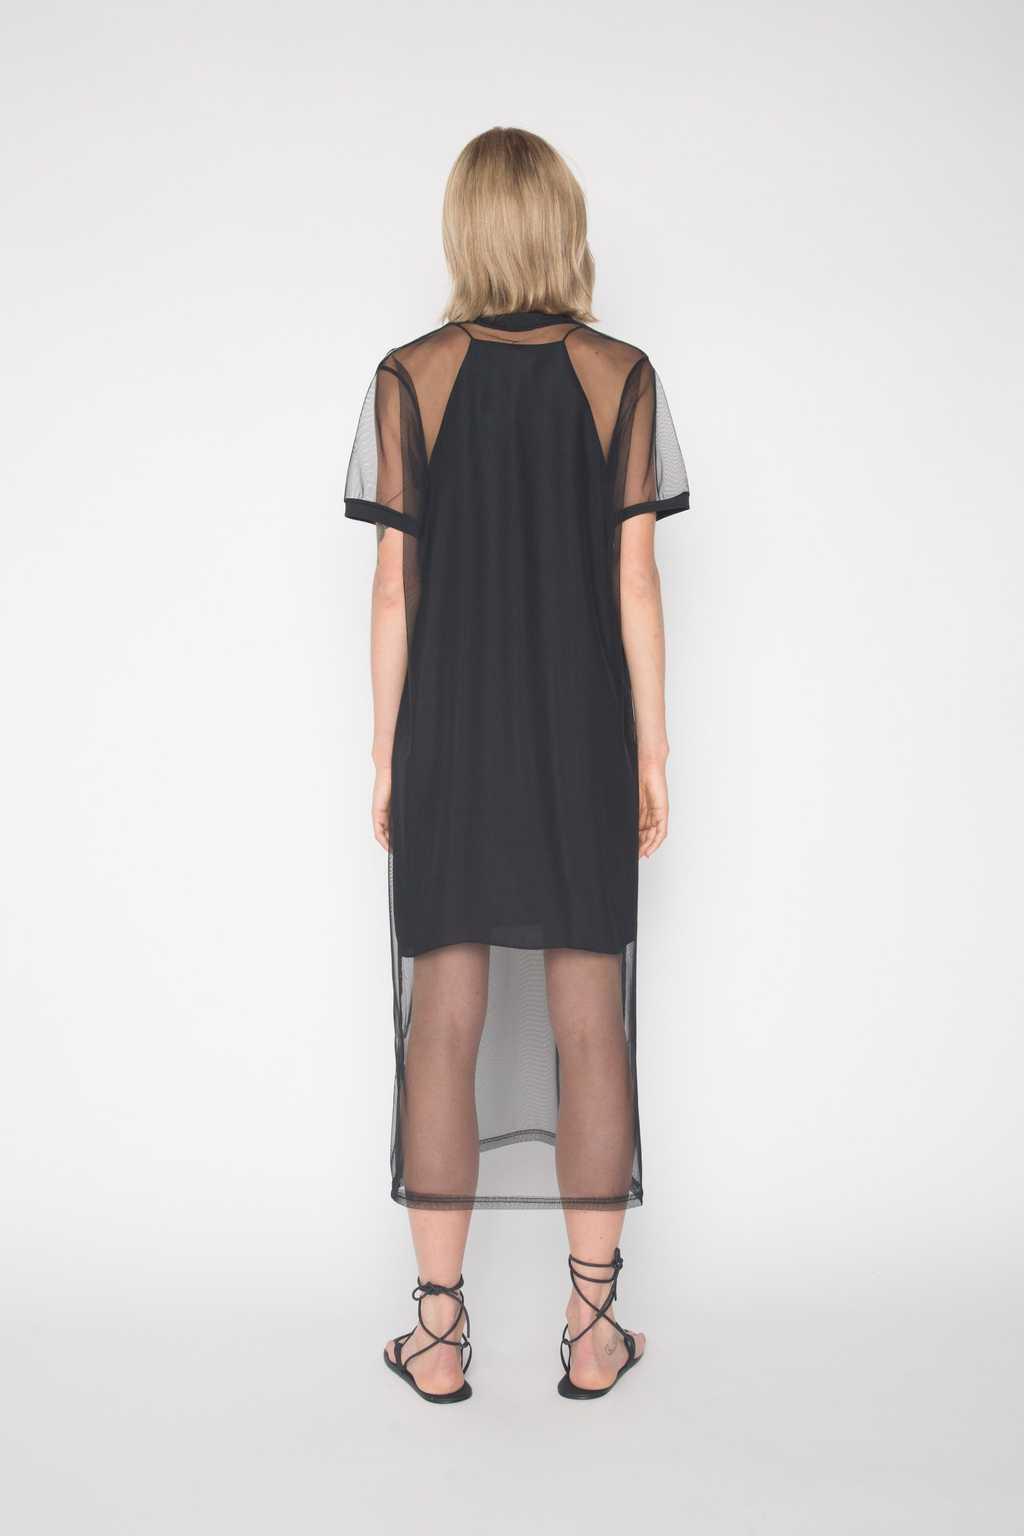 Mesh Dress H225 Black 4